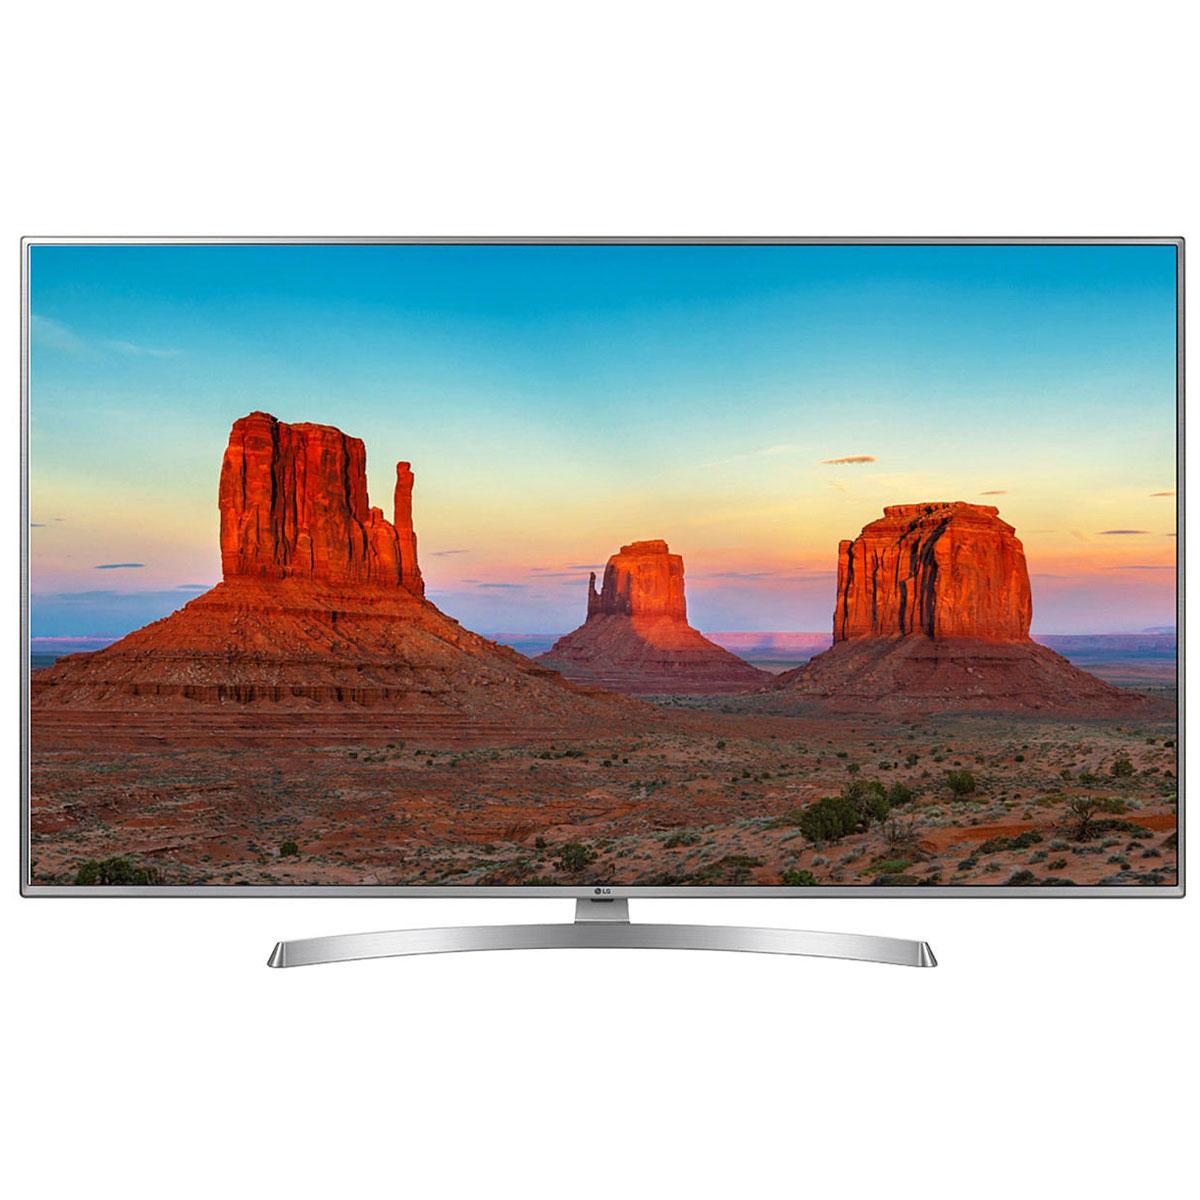 "TV LG 70UK6950 Téléviseur LED 4K 70"" (177 cm) 16/9 - 3840 x 2160 pixels - Ultra HD 2160p - HDR - Wi-Fi - Bluetooth - 100 Hz"